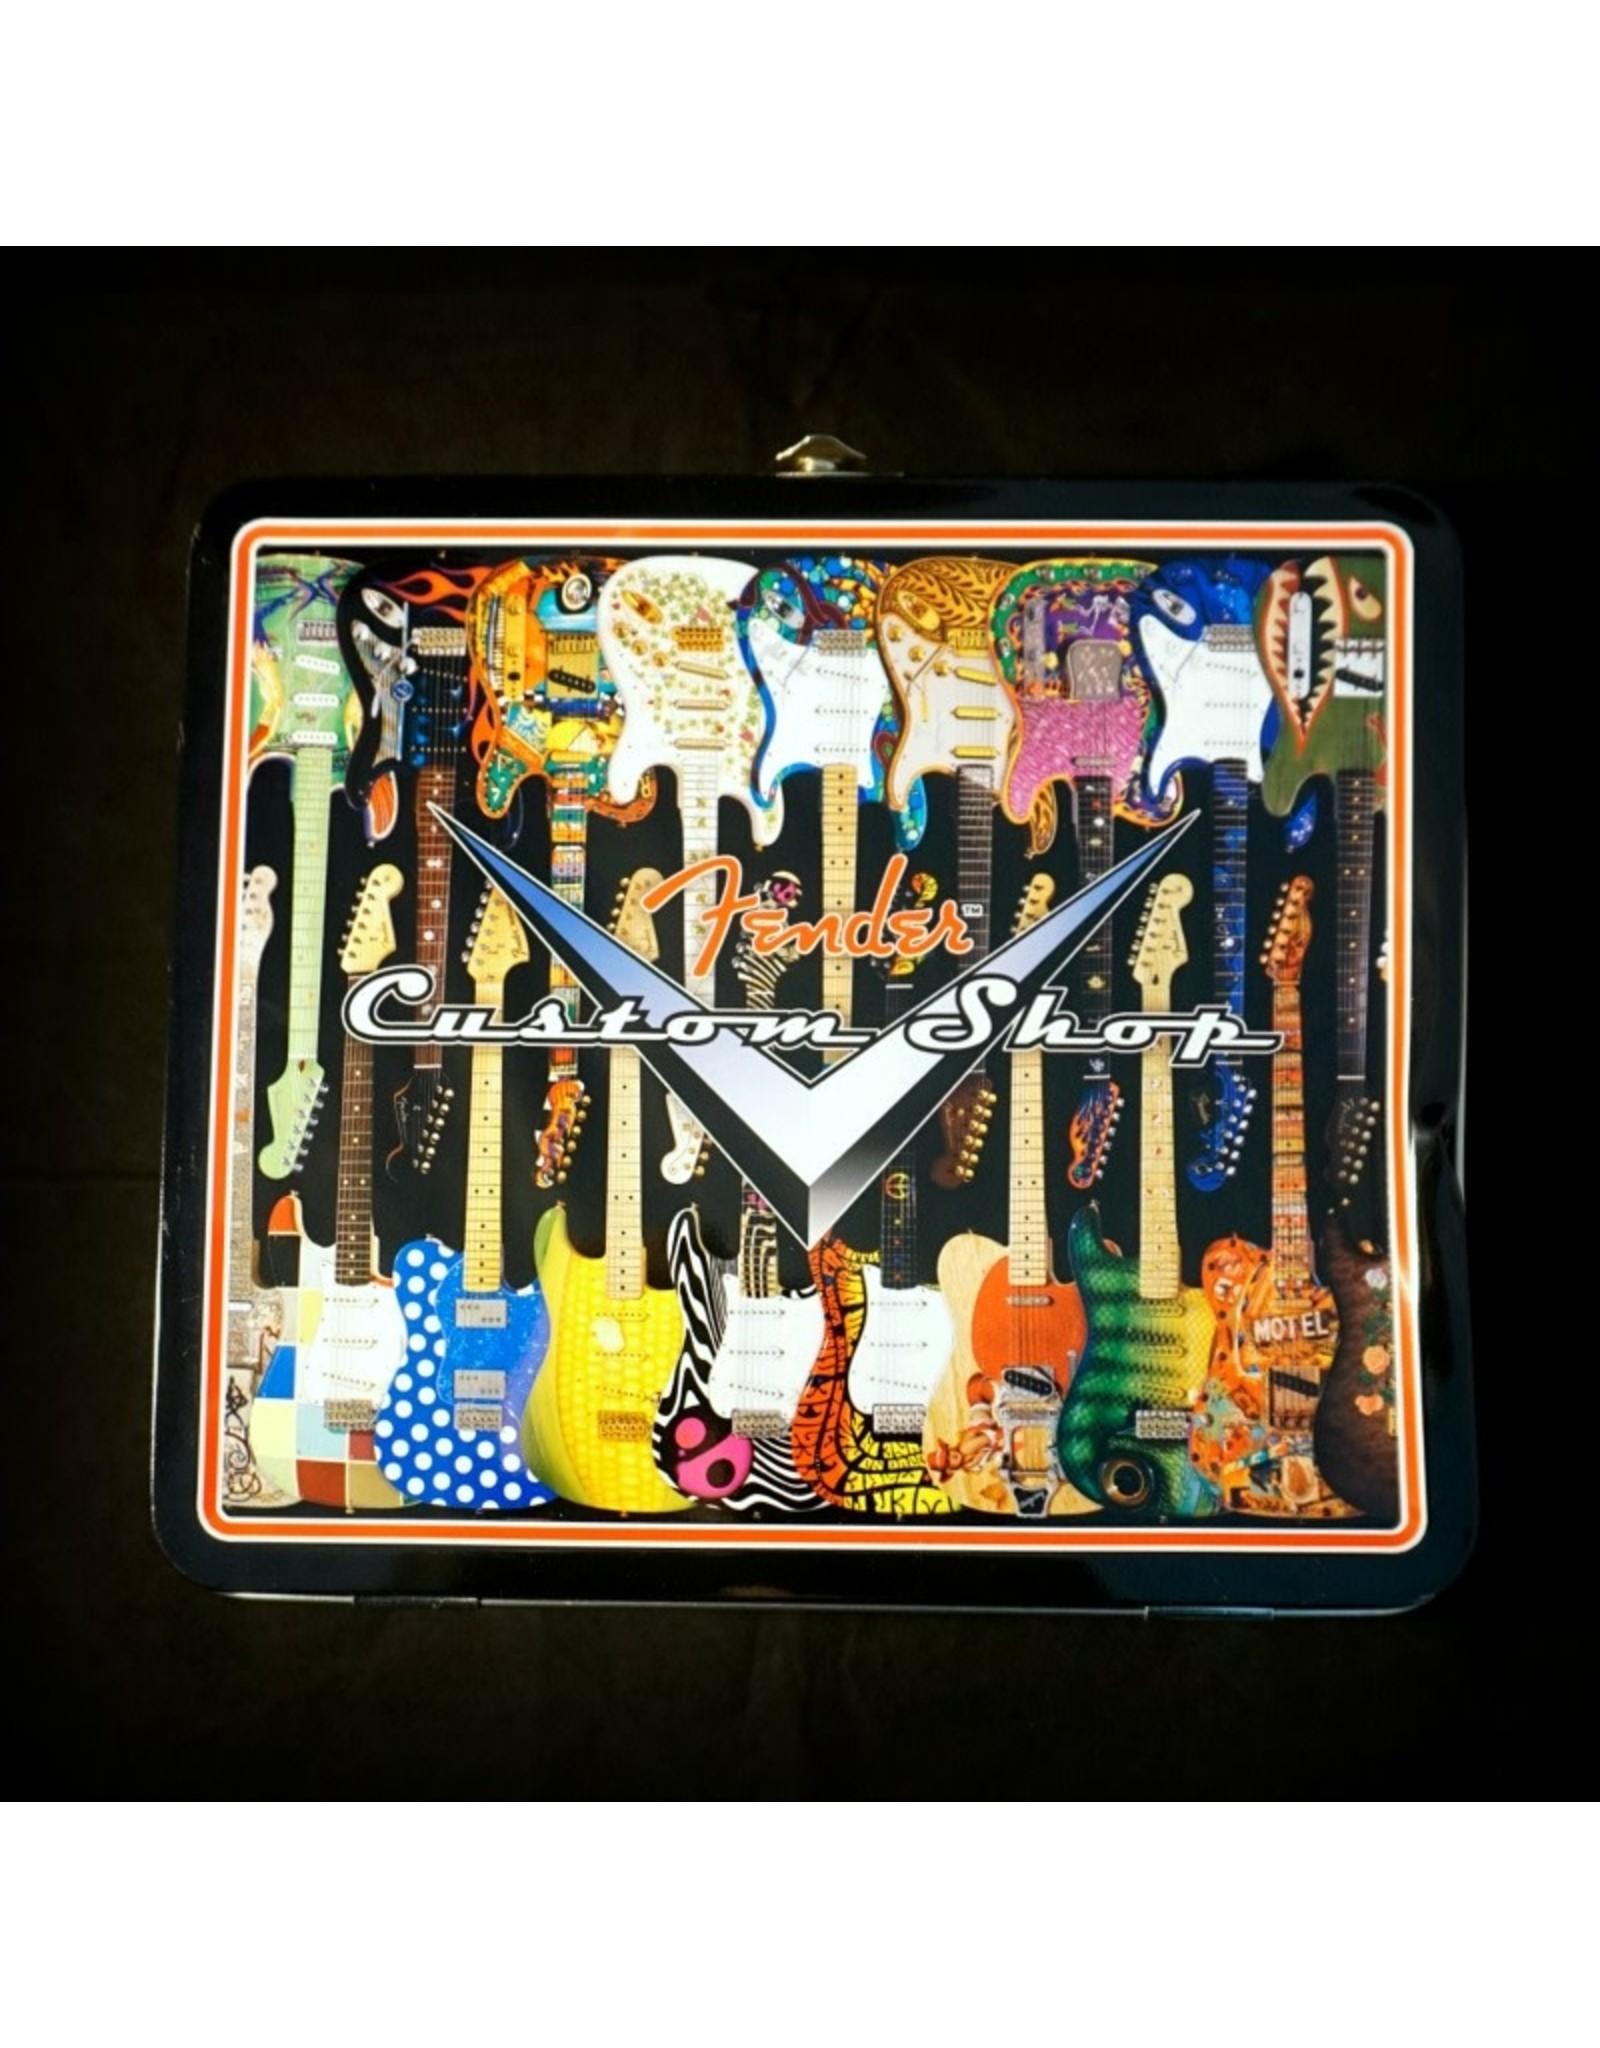 Fender Guitar Custom Shop Lunch Tin